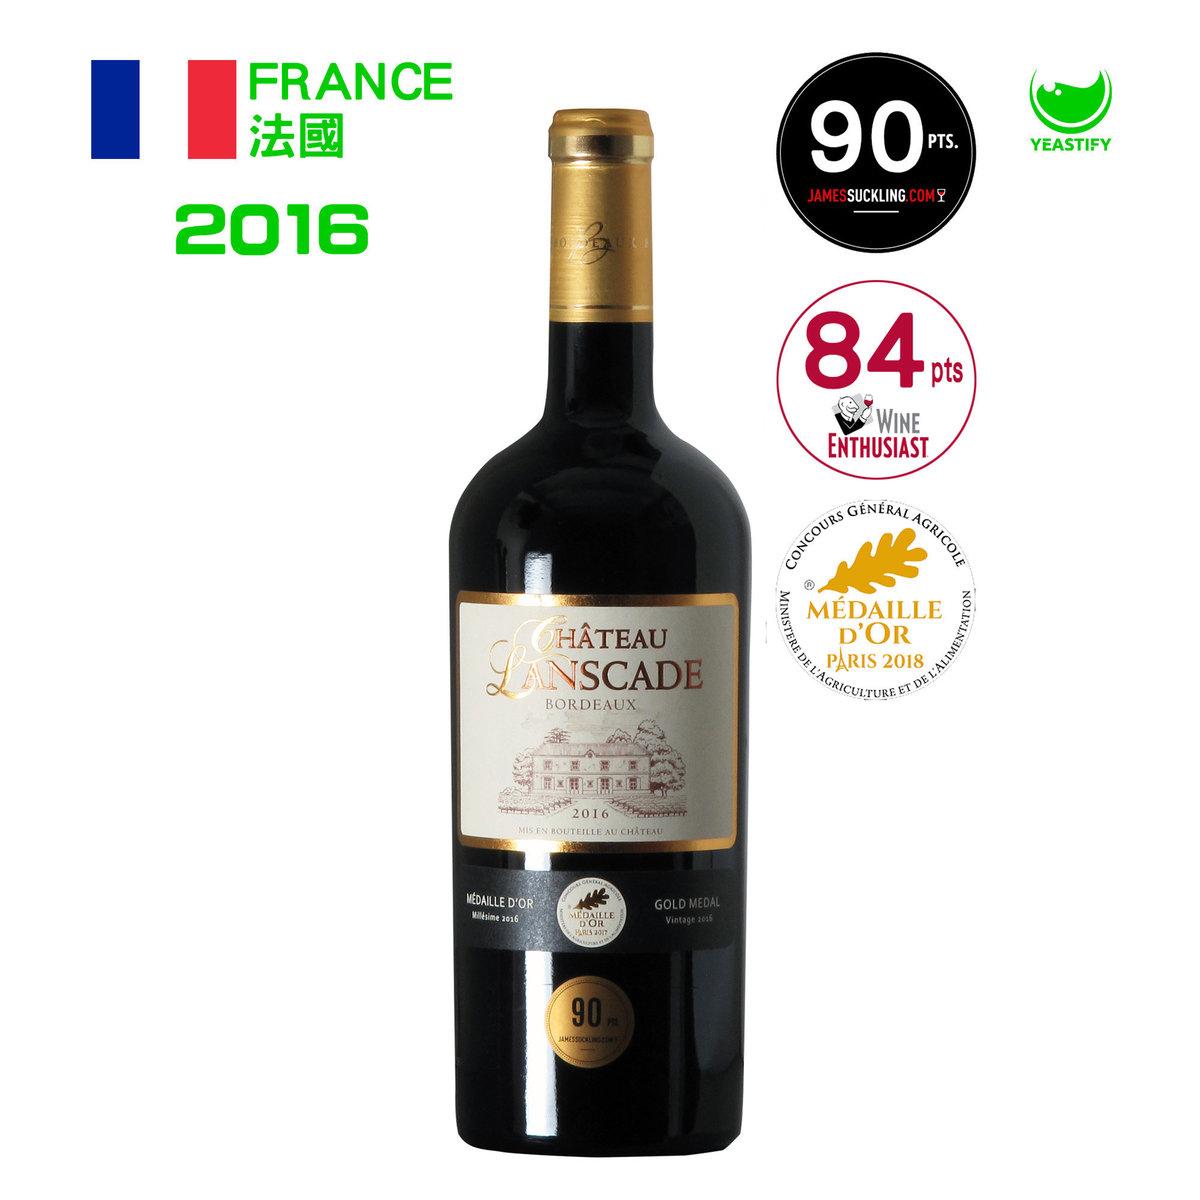 Lanscade Bordeaux 浪騎堡 波爾多 紅酒 2016